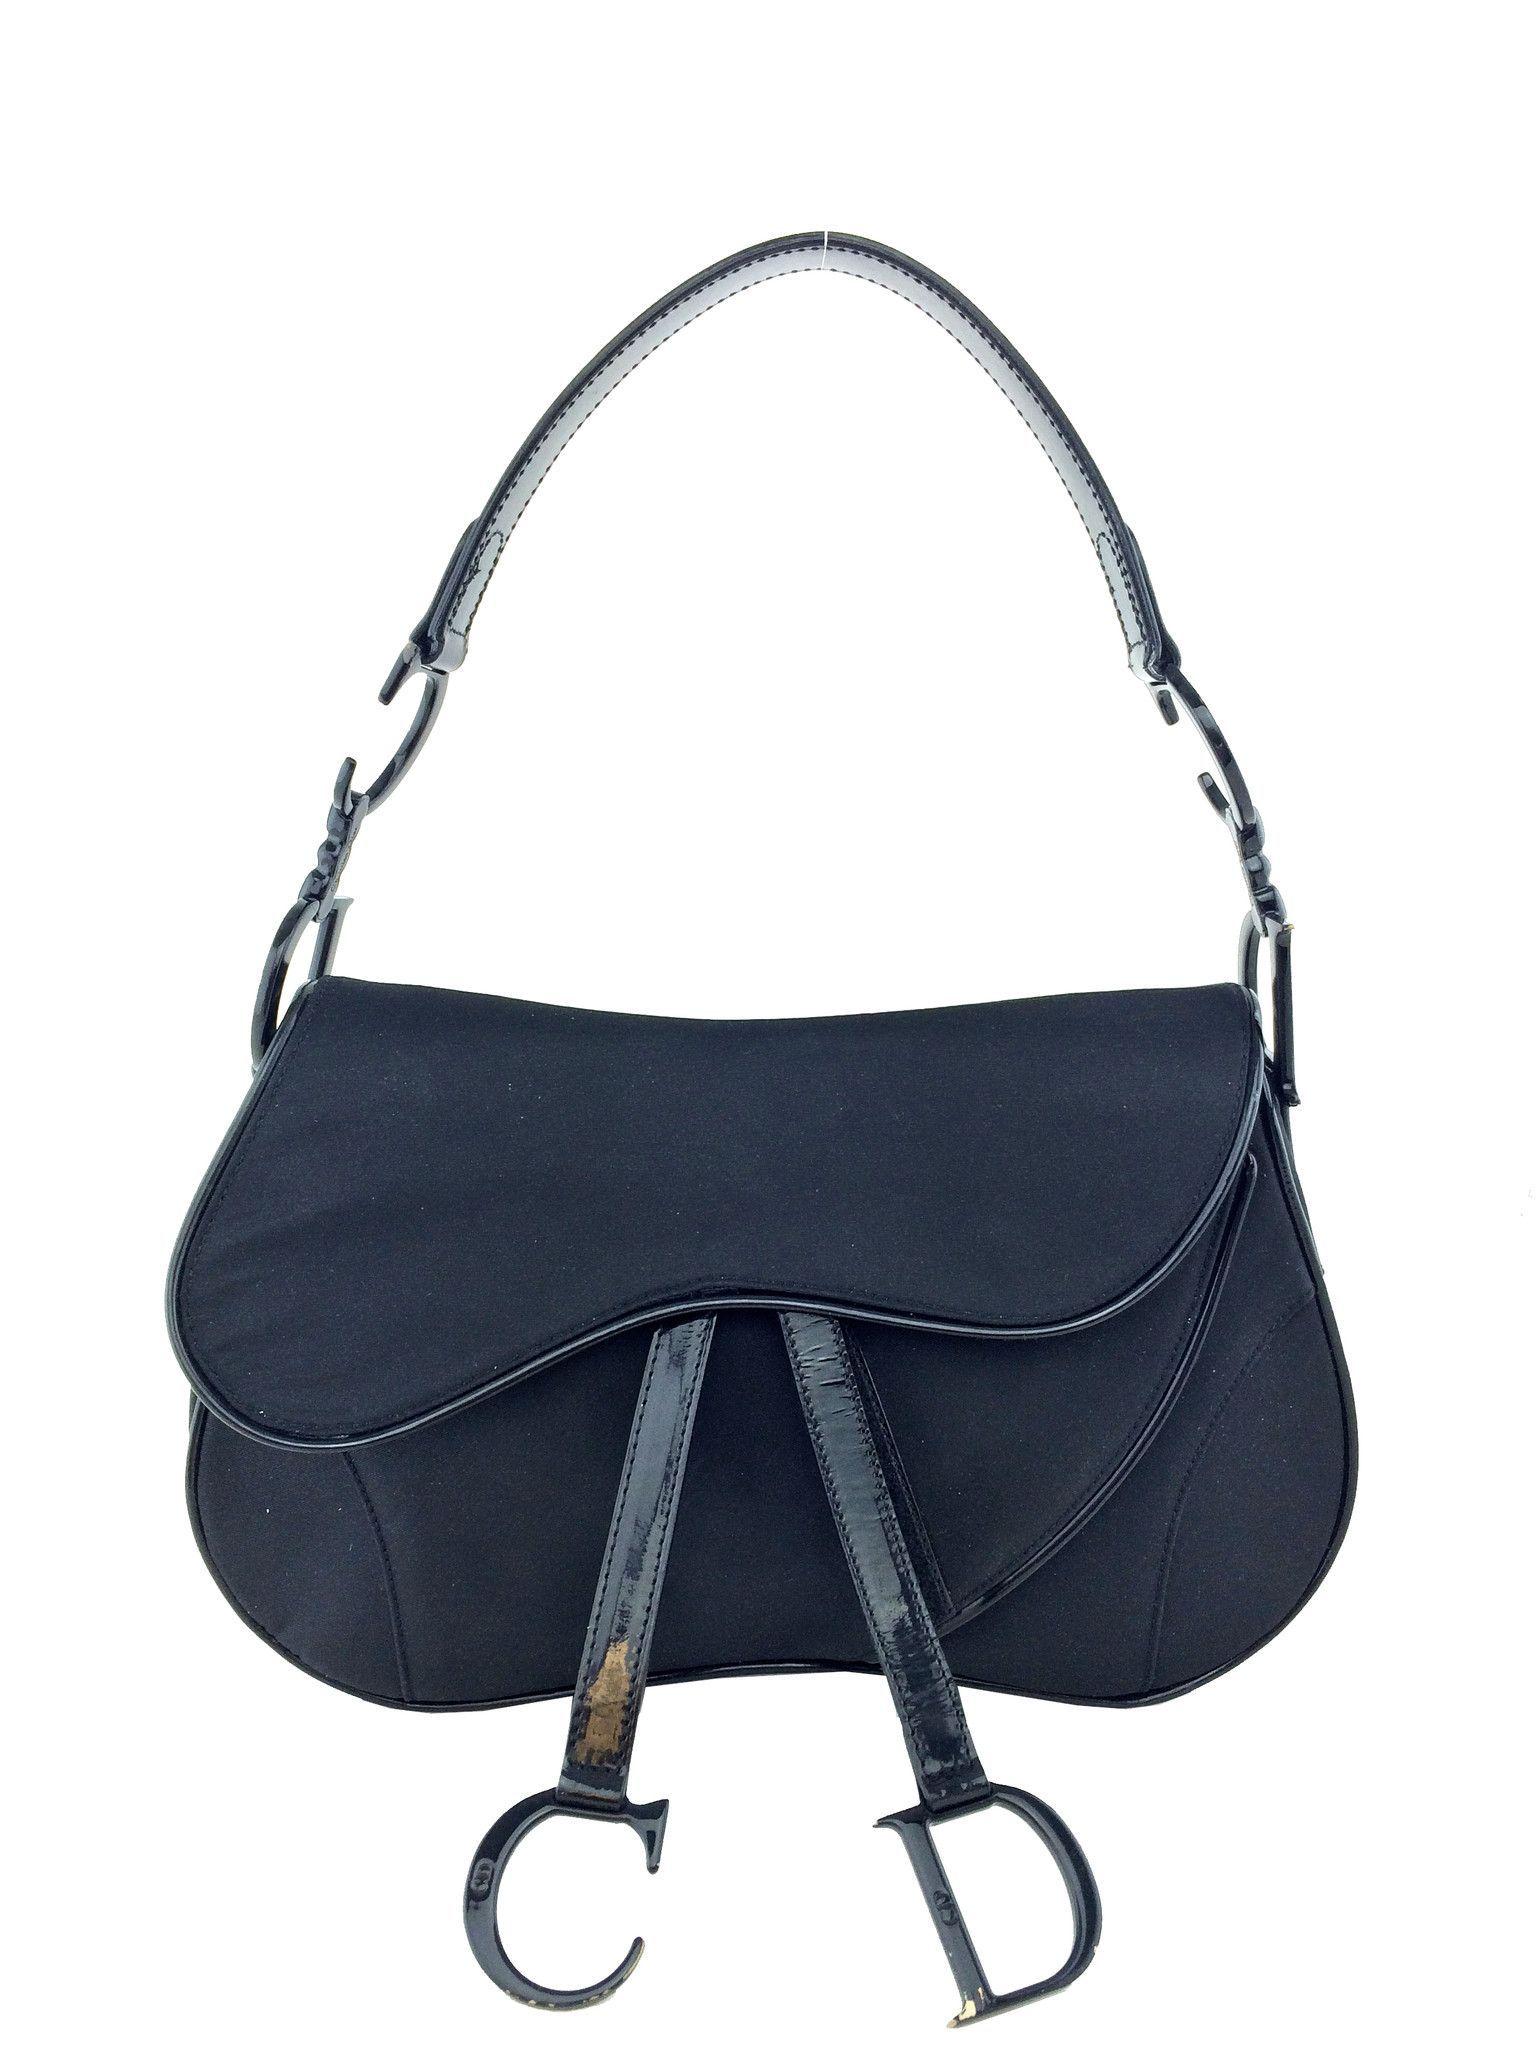 15ed7c52e32c Christian Dior Nylon Saddle Bag Black